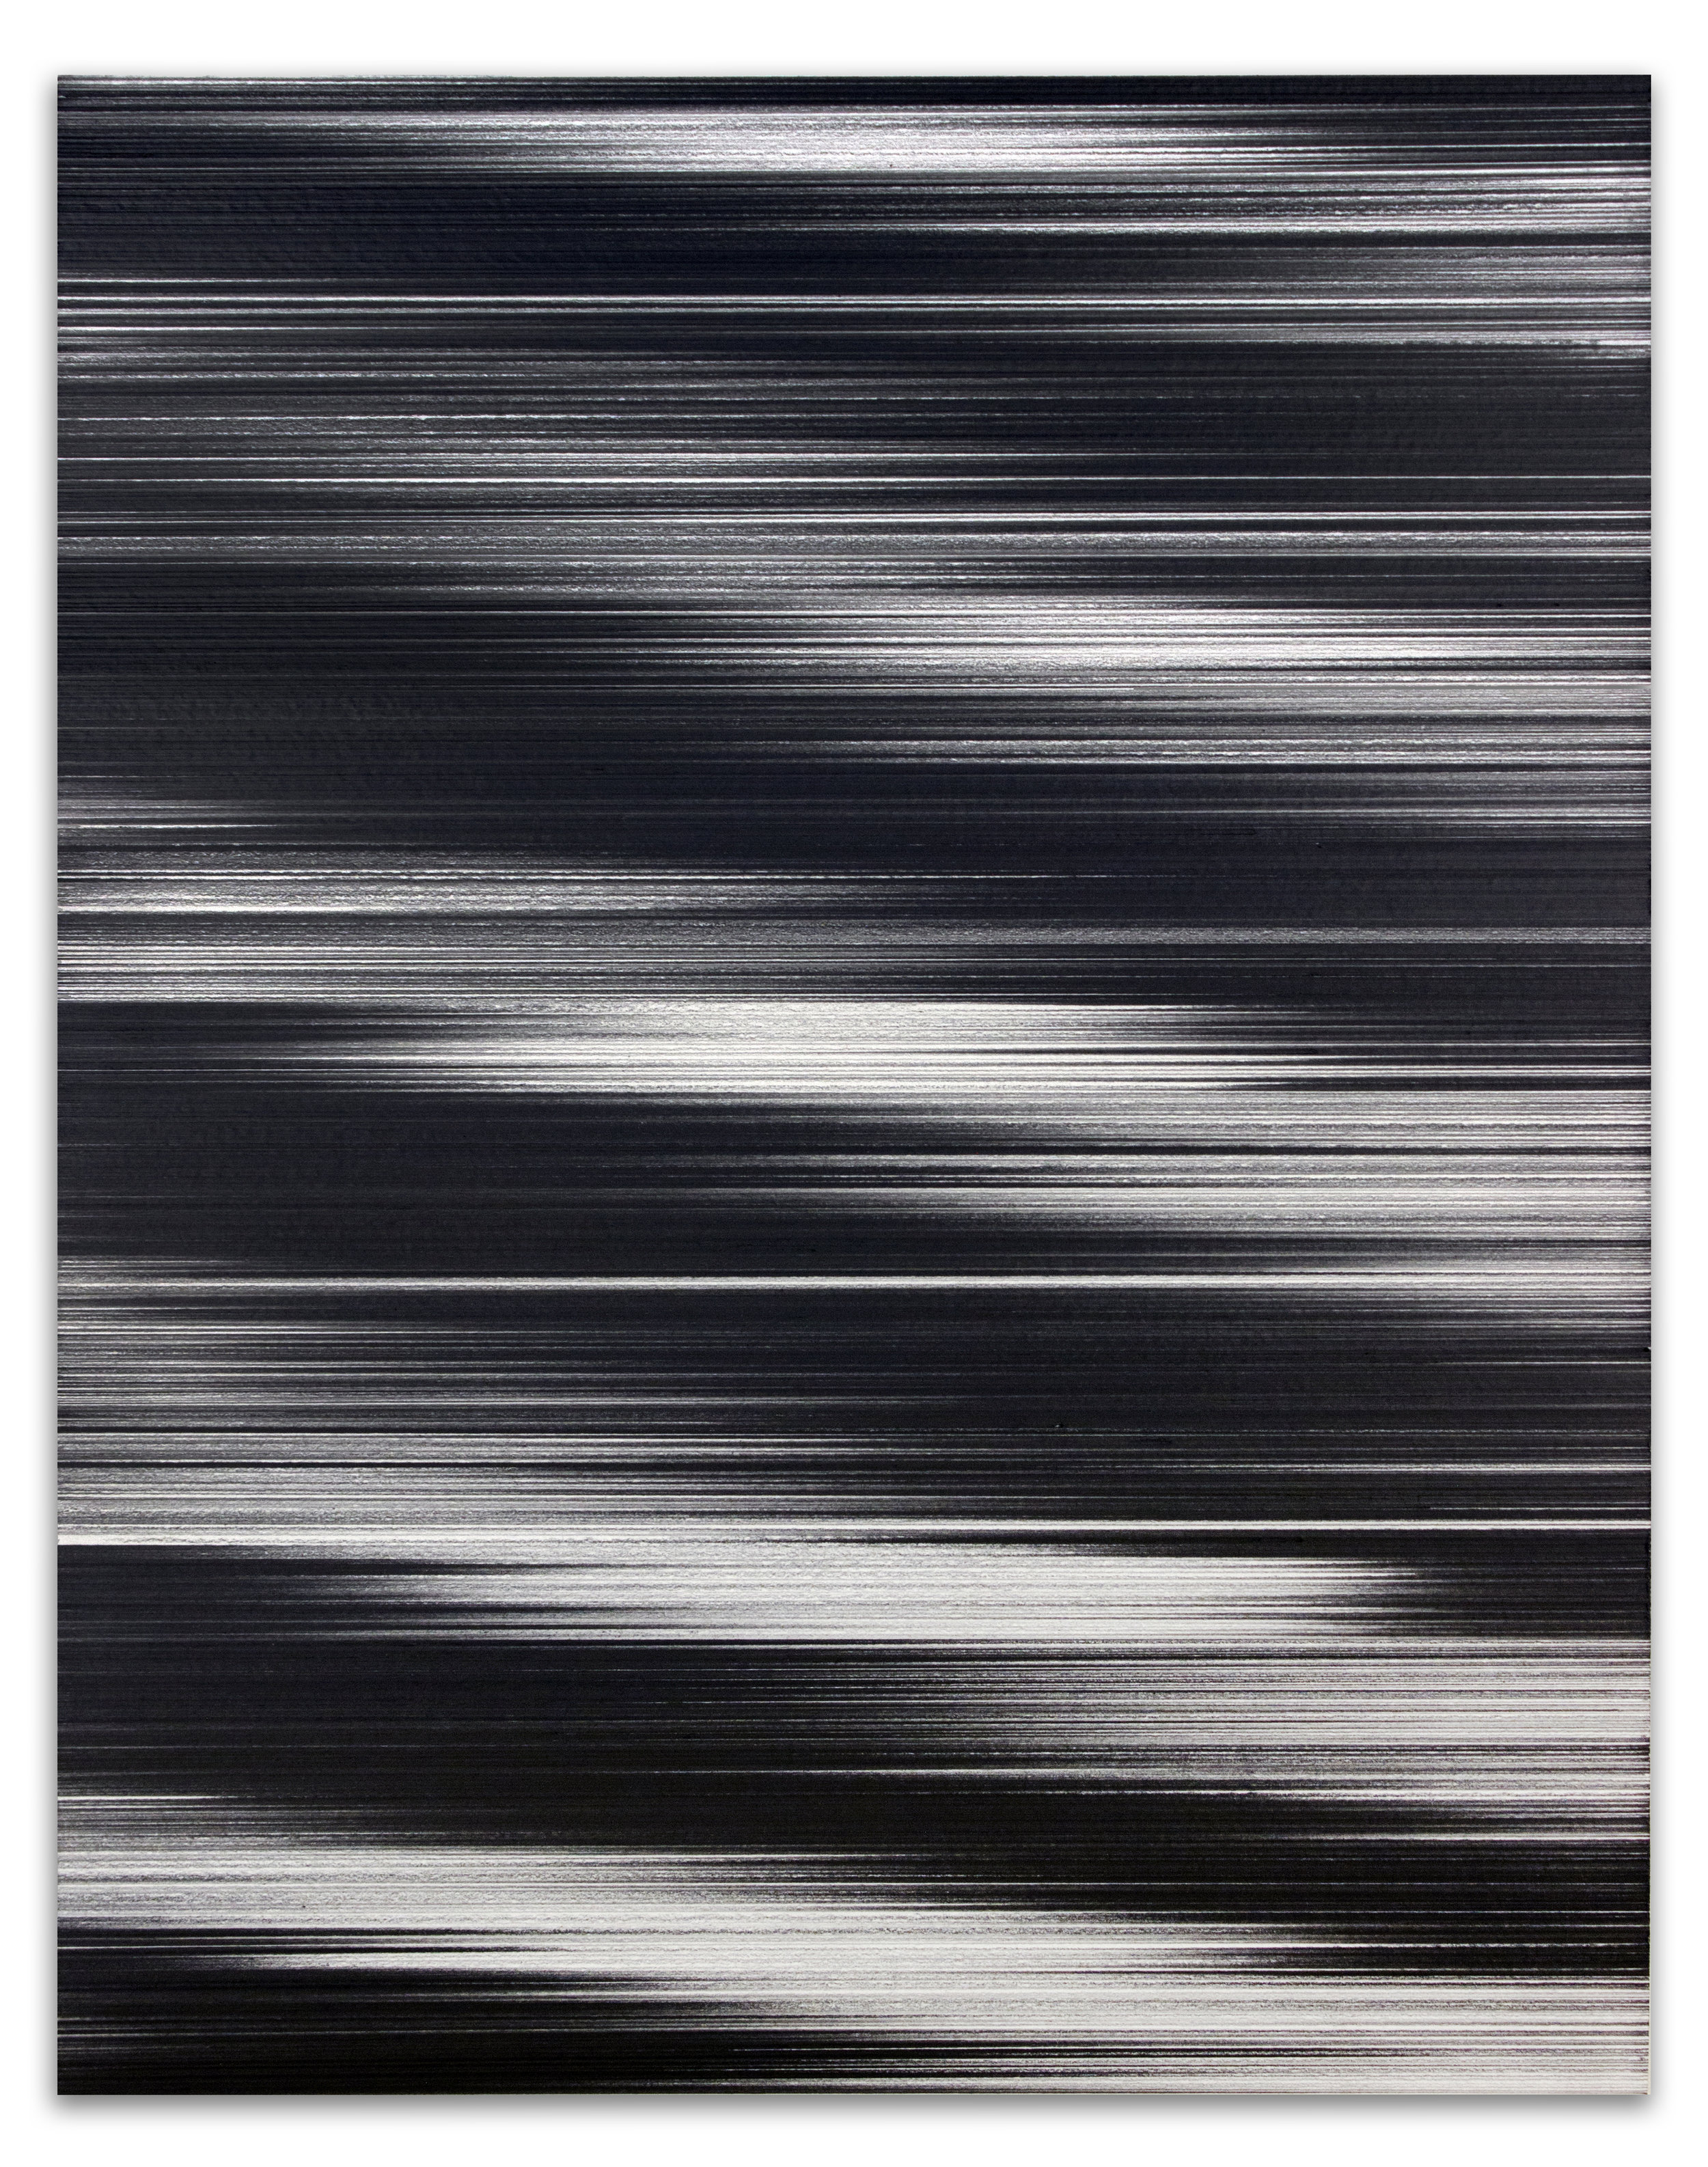 Waves in Black & White No. 1